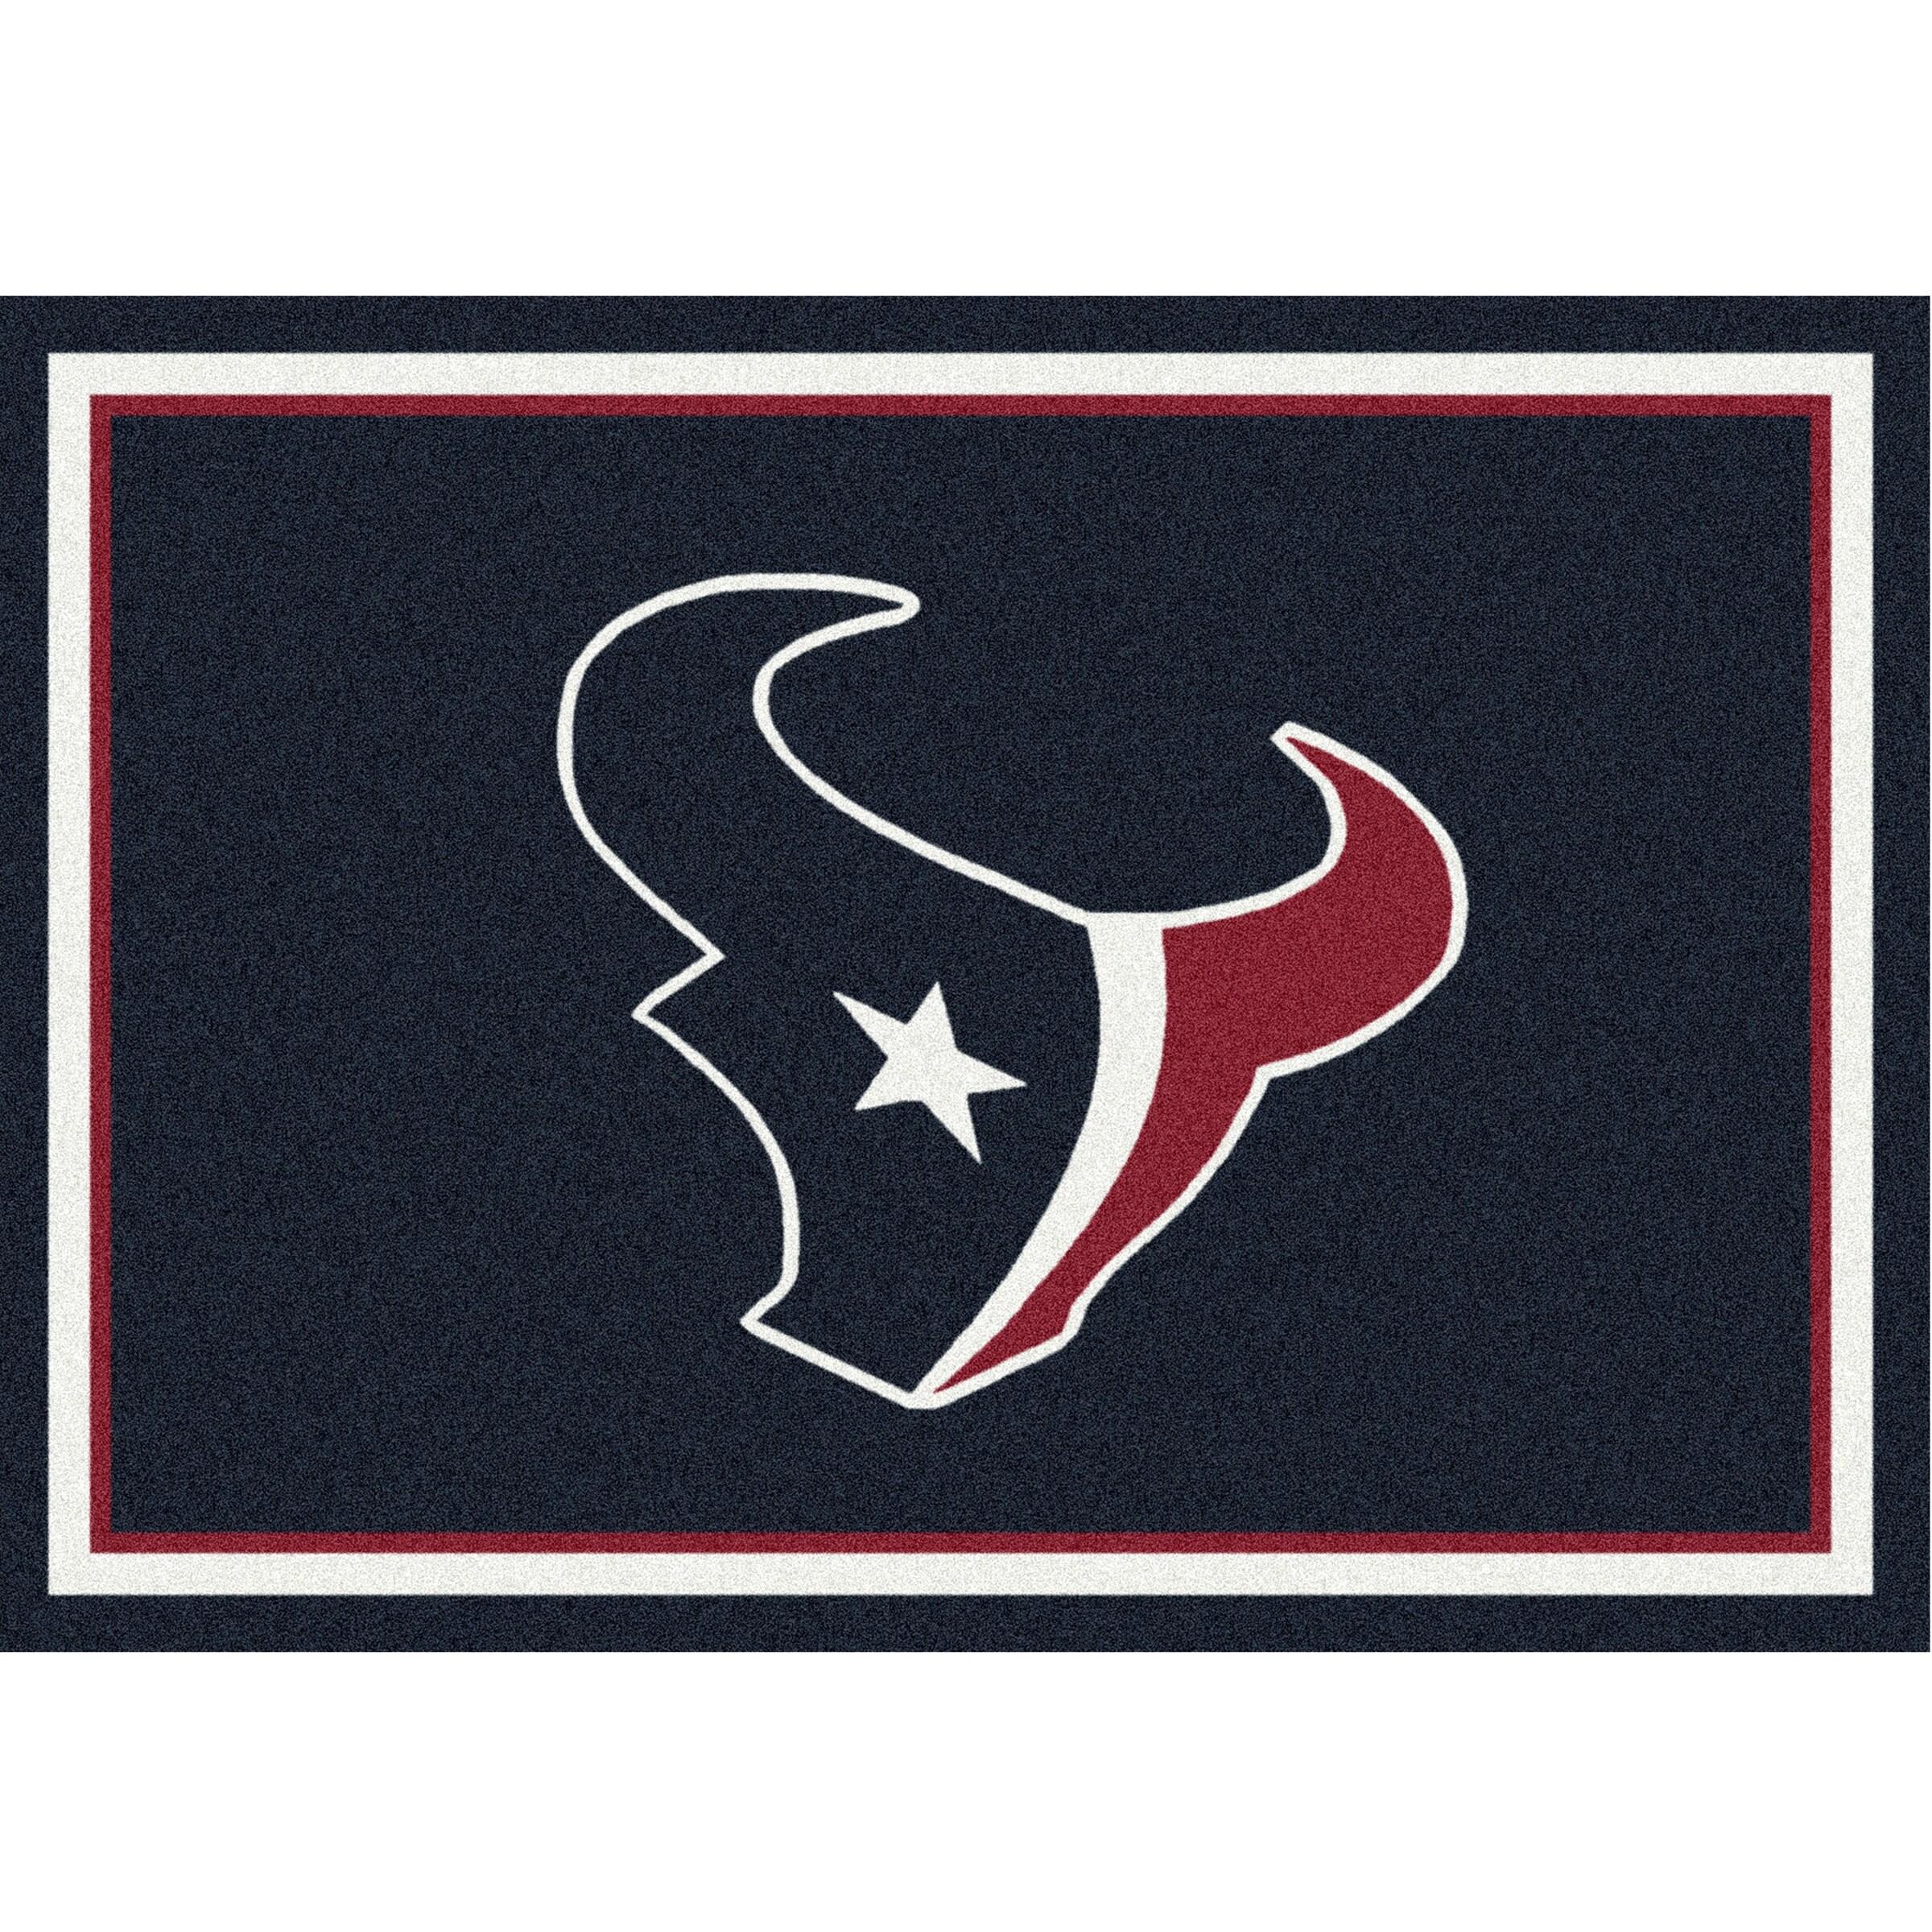 Houston Texans Imperial 4' x 6' Spirit Rug